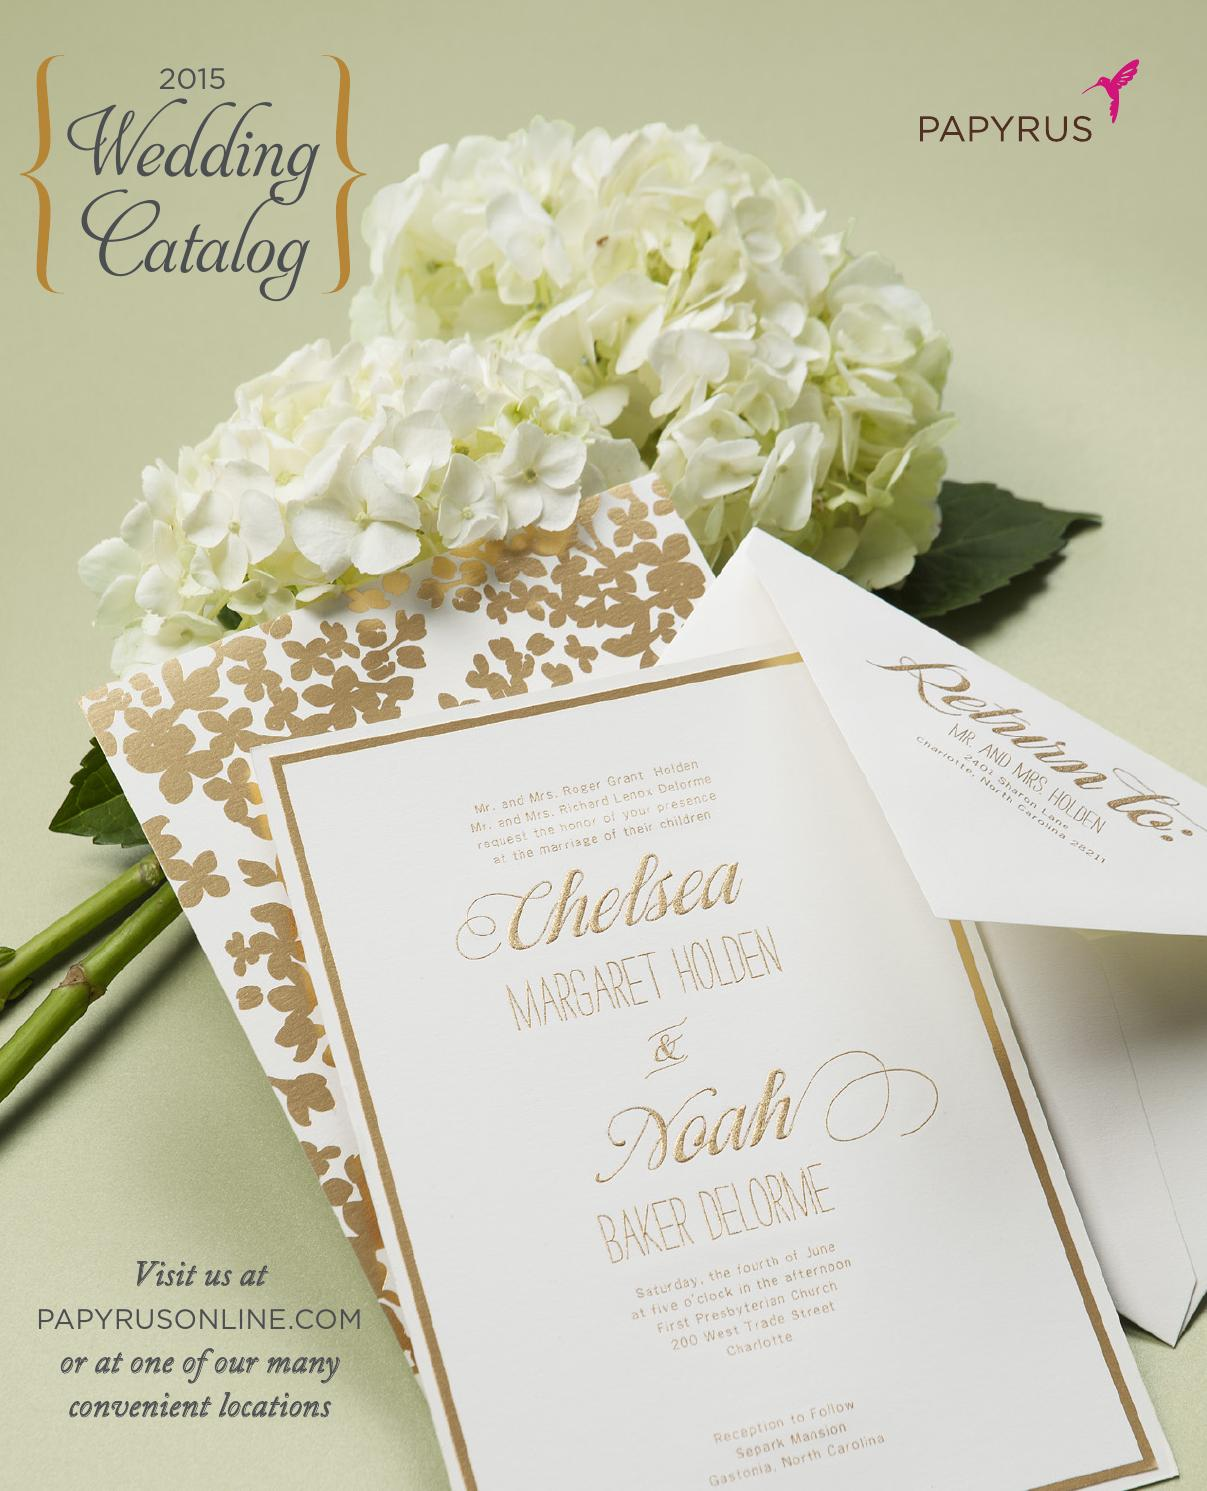 papyrus 2015 wedding custom printing catalog by papyrus retail issuu - Papyrus Wedding Invitations